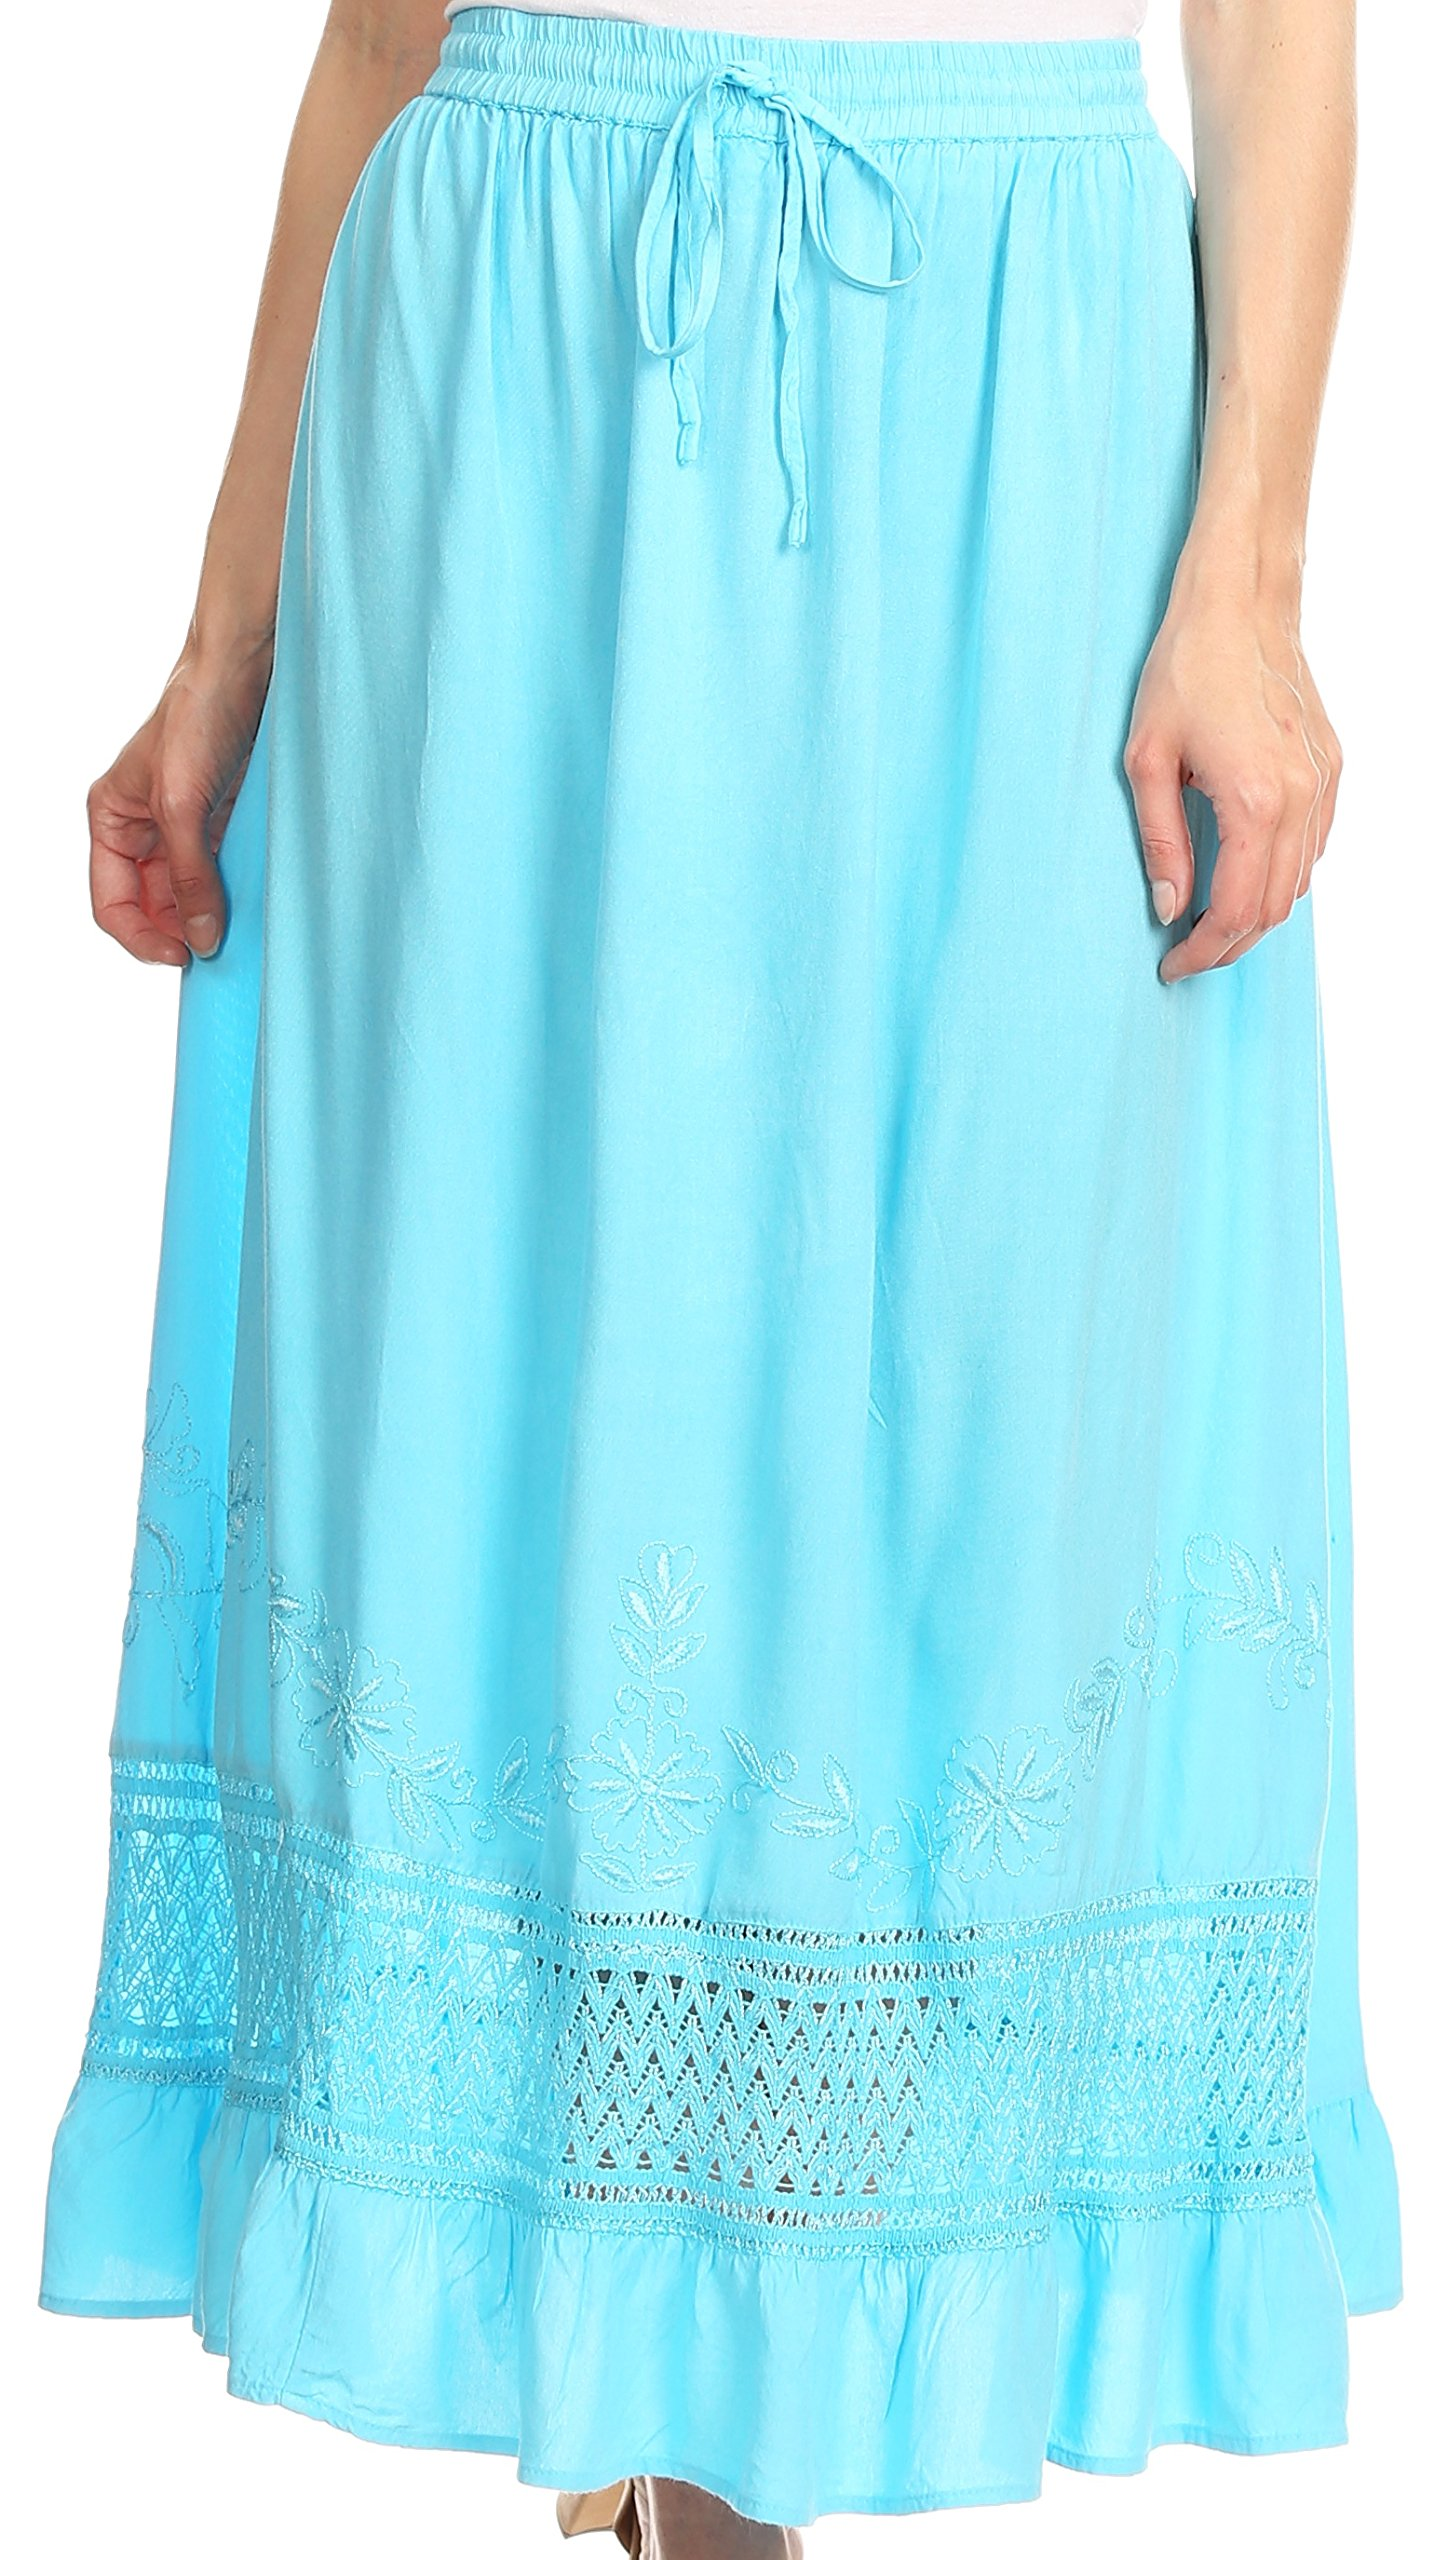 Sakkas 80211 - Harley Bohemian Embroidered Ethnic Maxi Skirt Adjustable Waist Ruffle Trim - Light Blue - OS